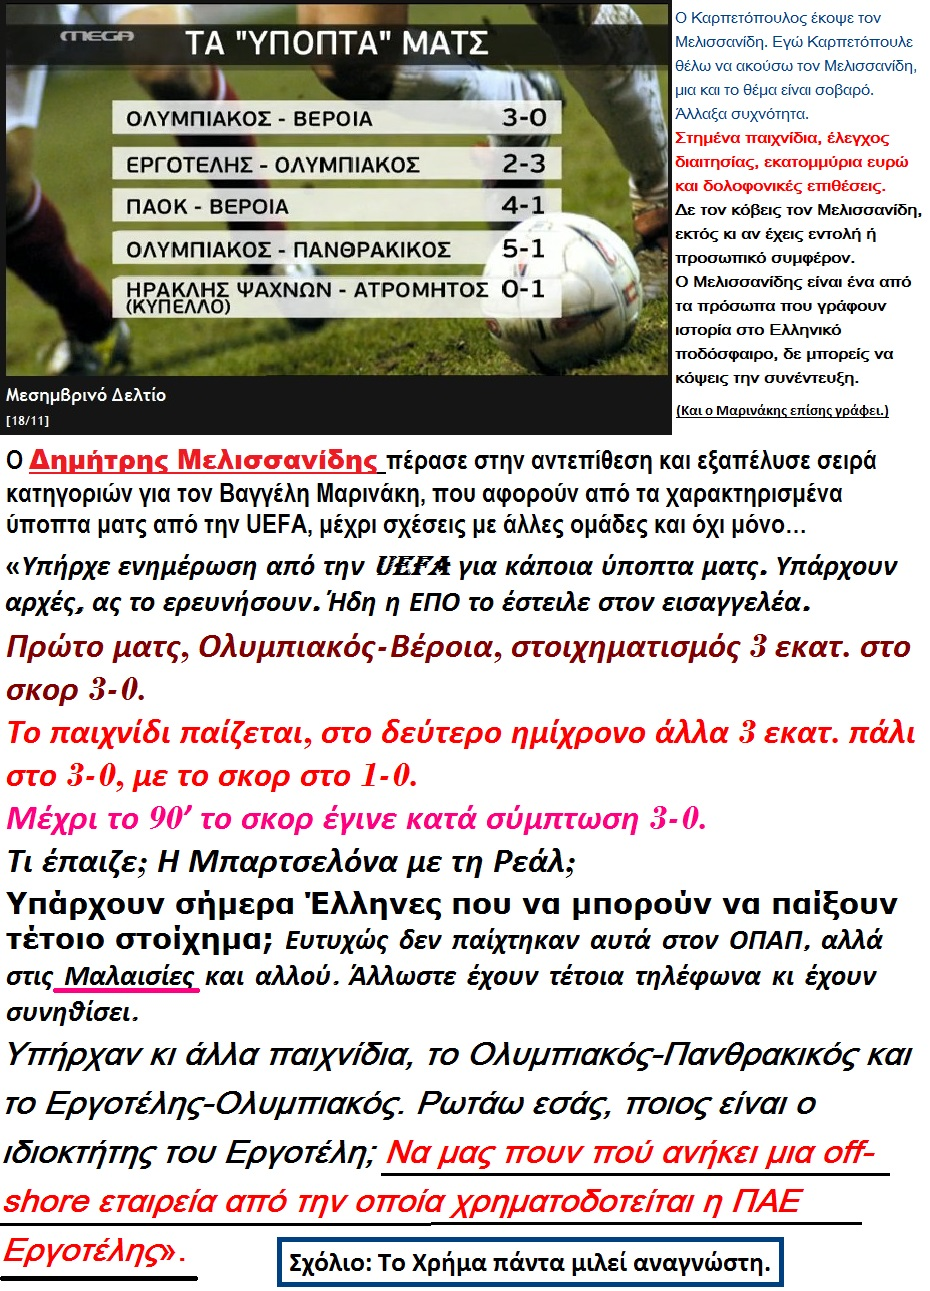 FOOTBALL ELLADA UEFA STHMENA MATCH MELISSANIDHS 01 201114